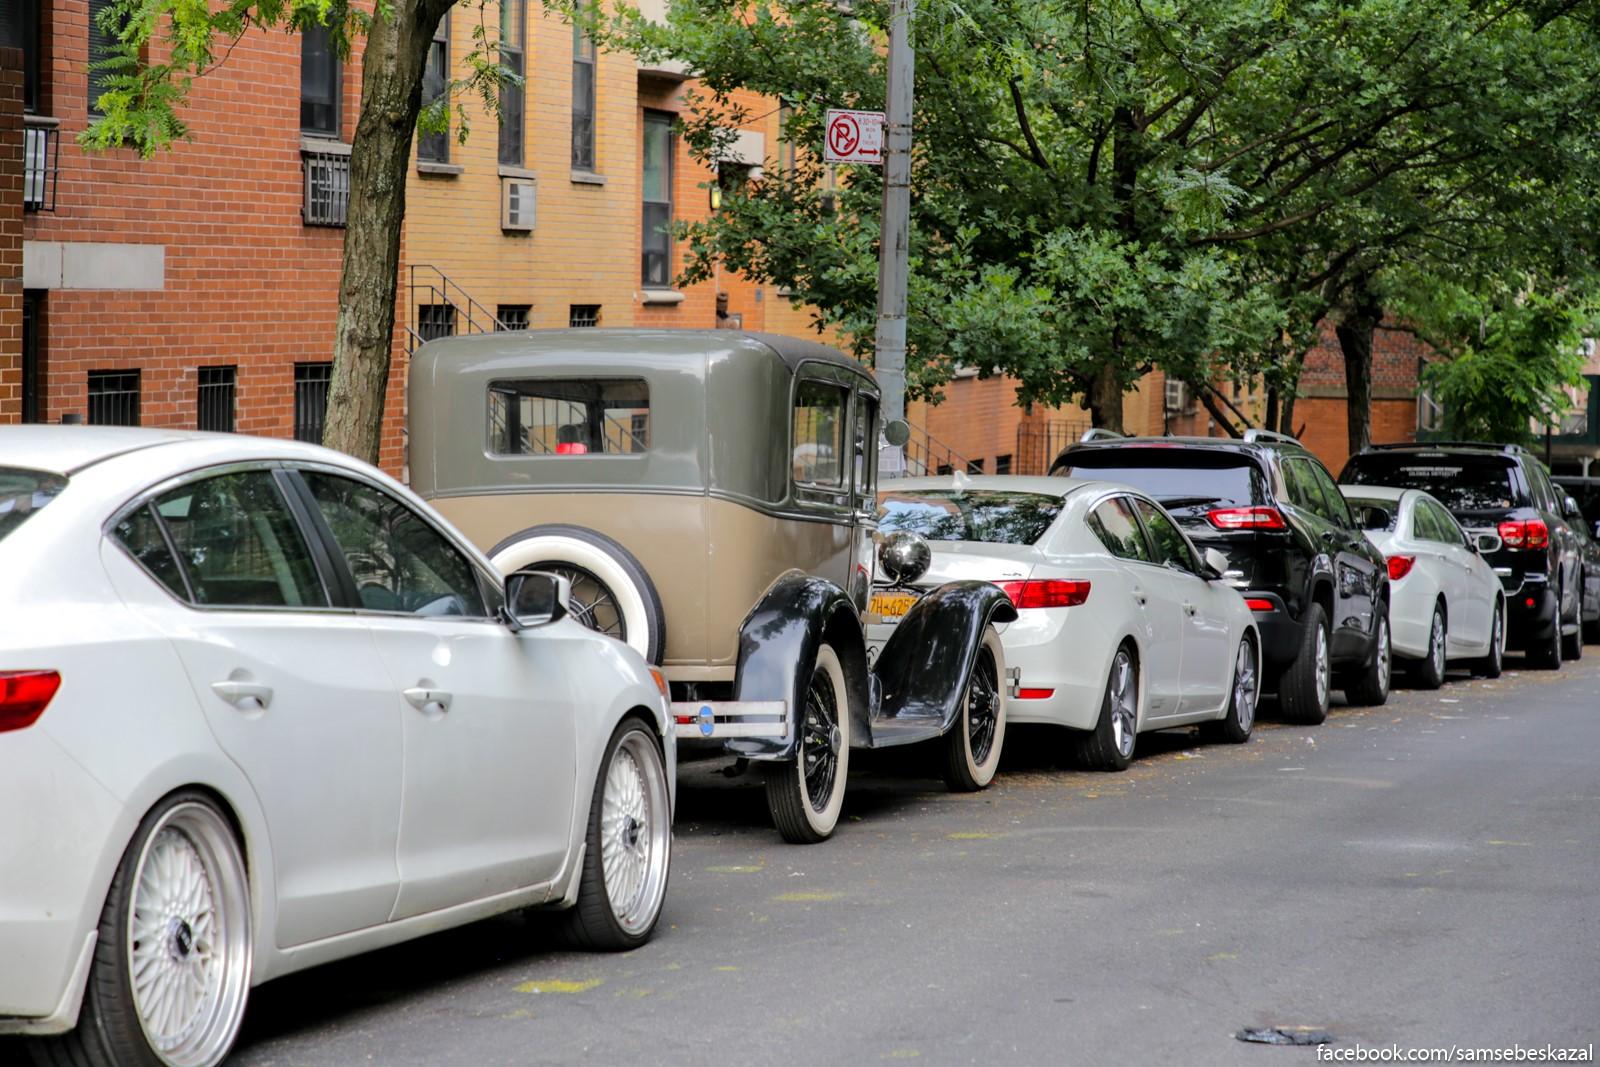 Zaparkovannye masiny na odnoj iz ulic Garlema.